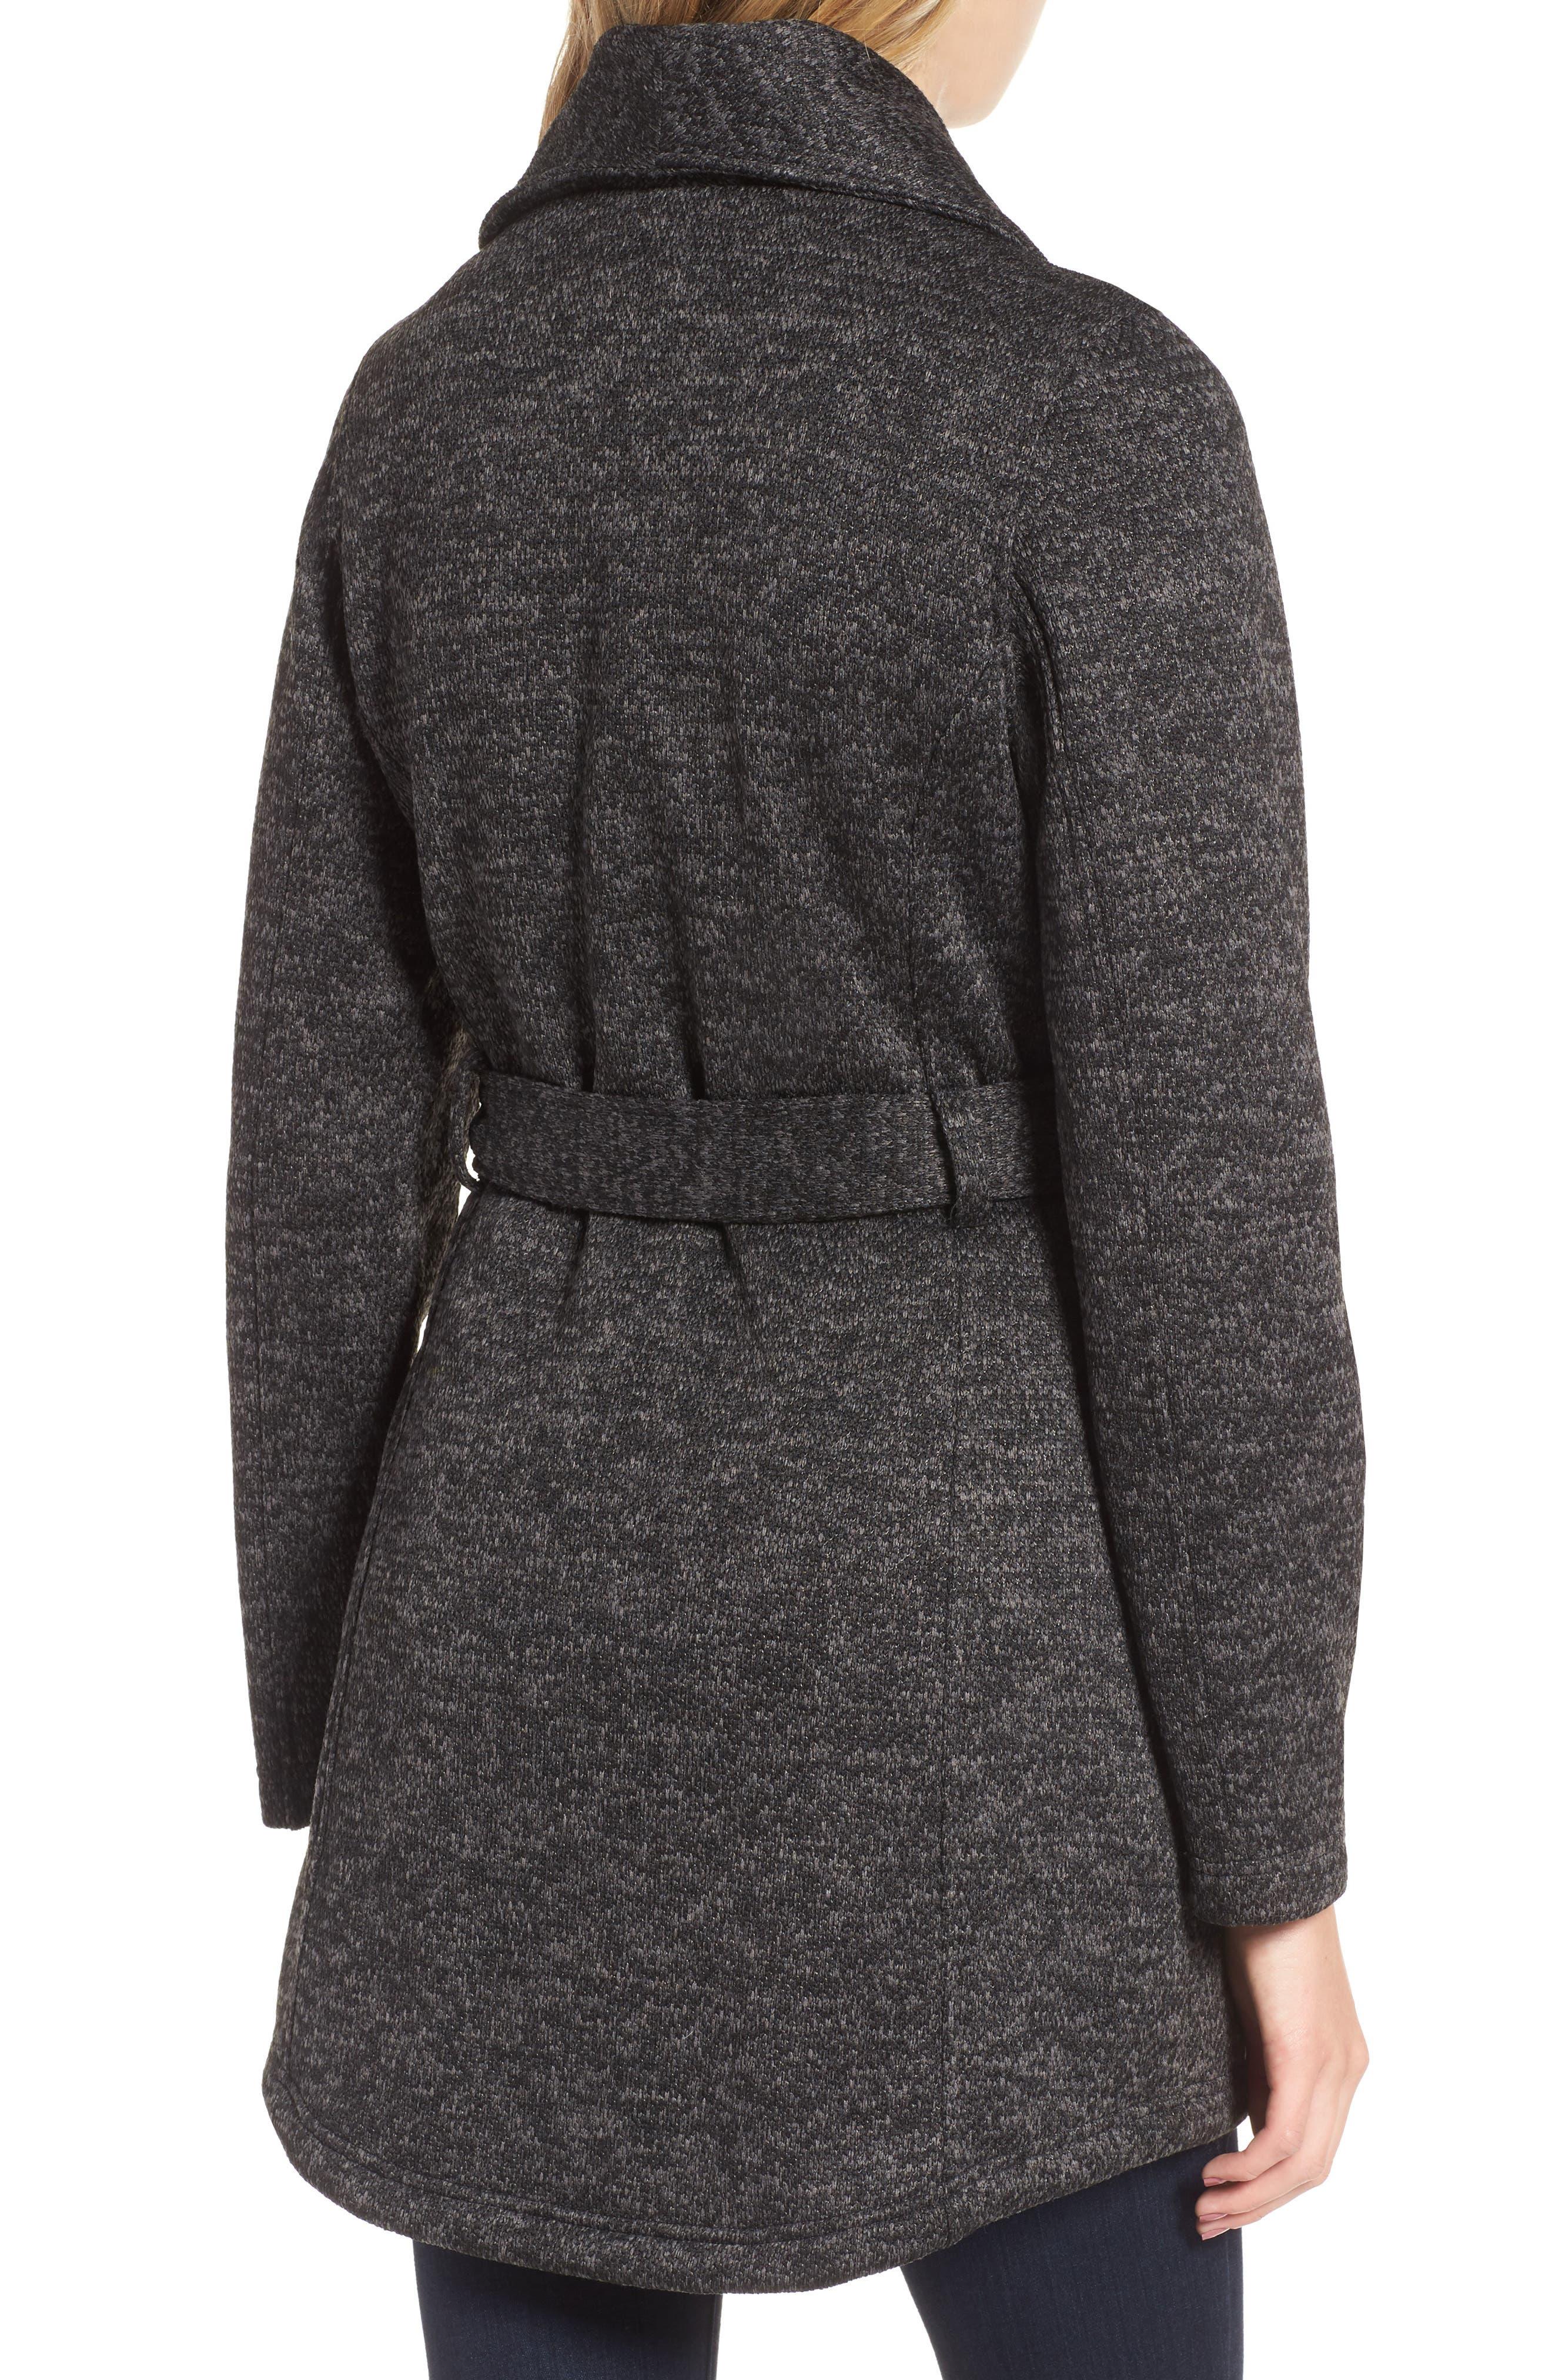 Fleece Wrap Coat,                             Alternate thumbnail 2, color,                             Charcoal Heather